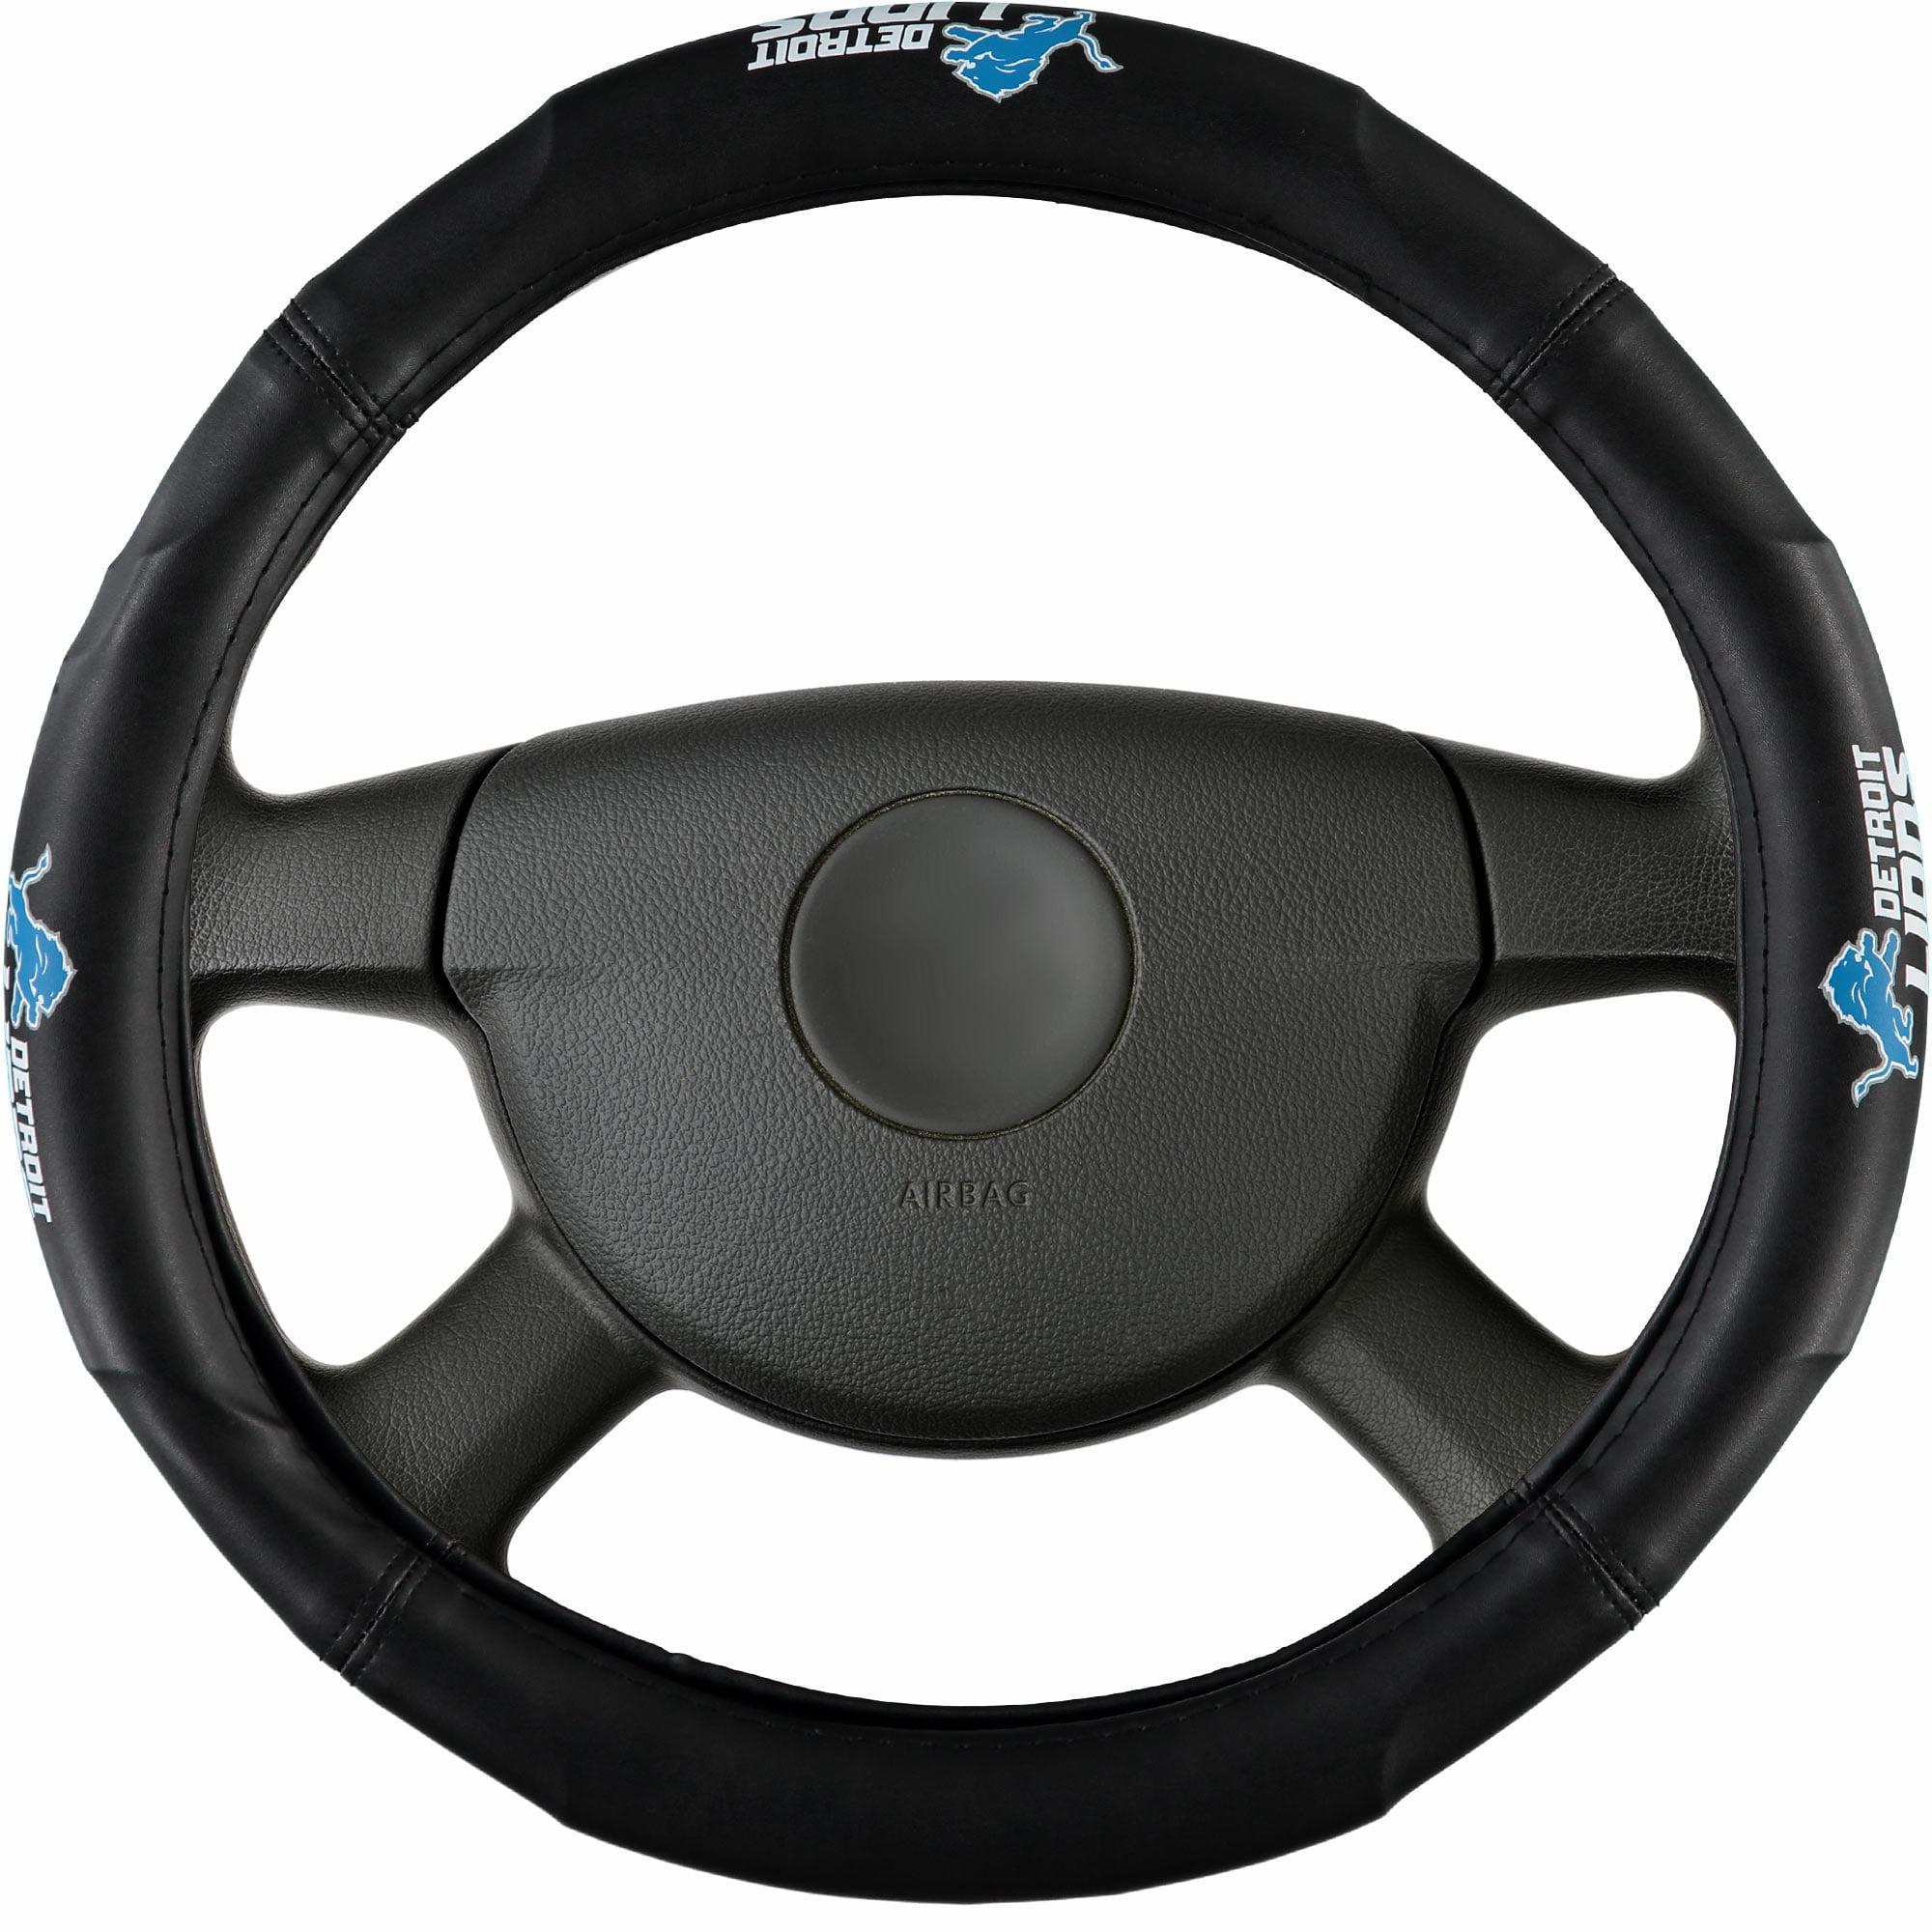 Detroit Lions Steering Wheel Cover - Black - No Size